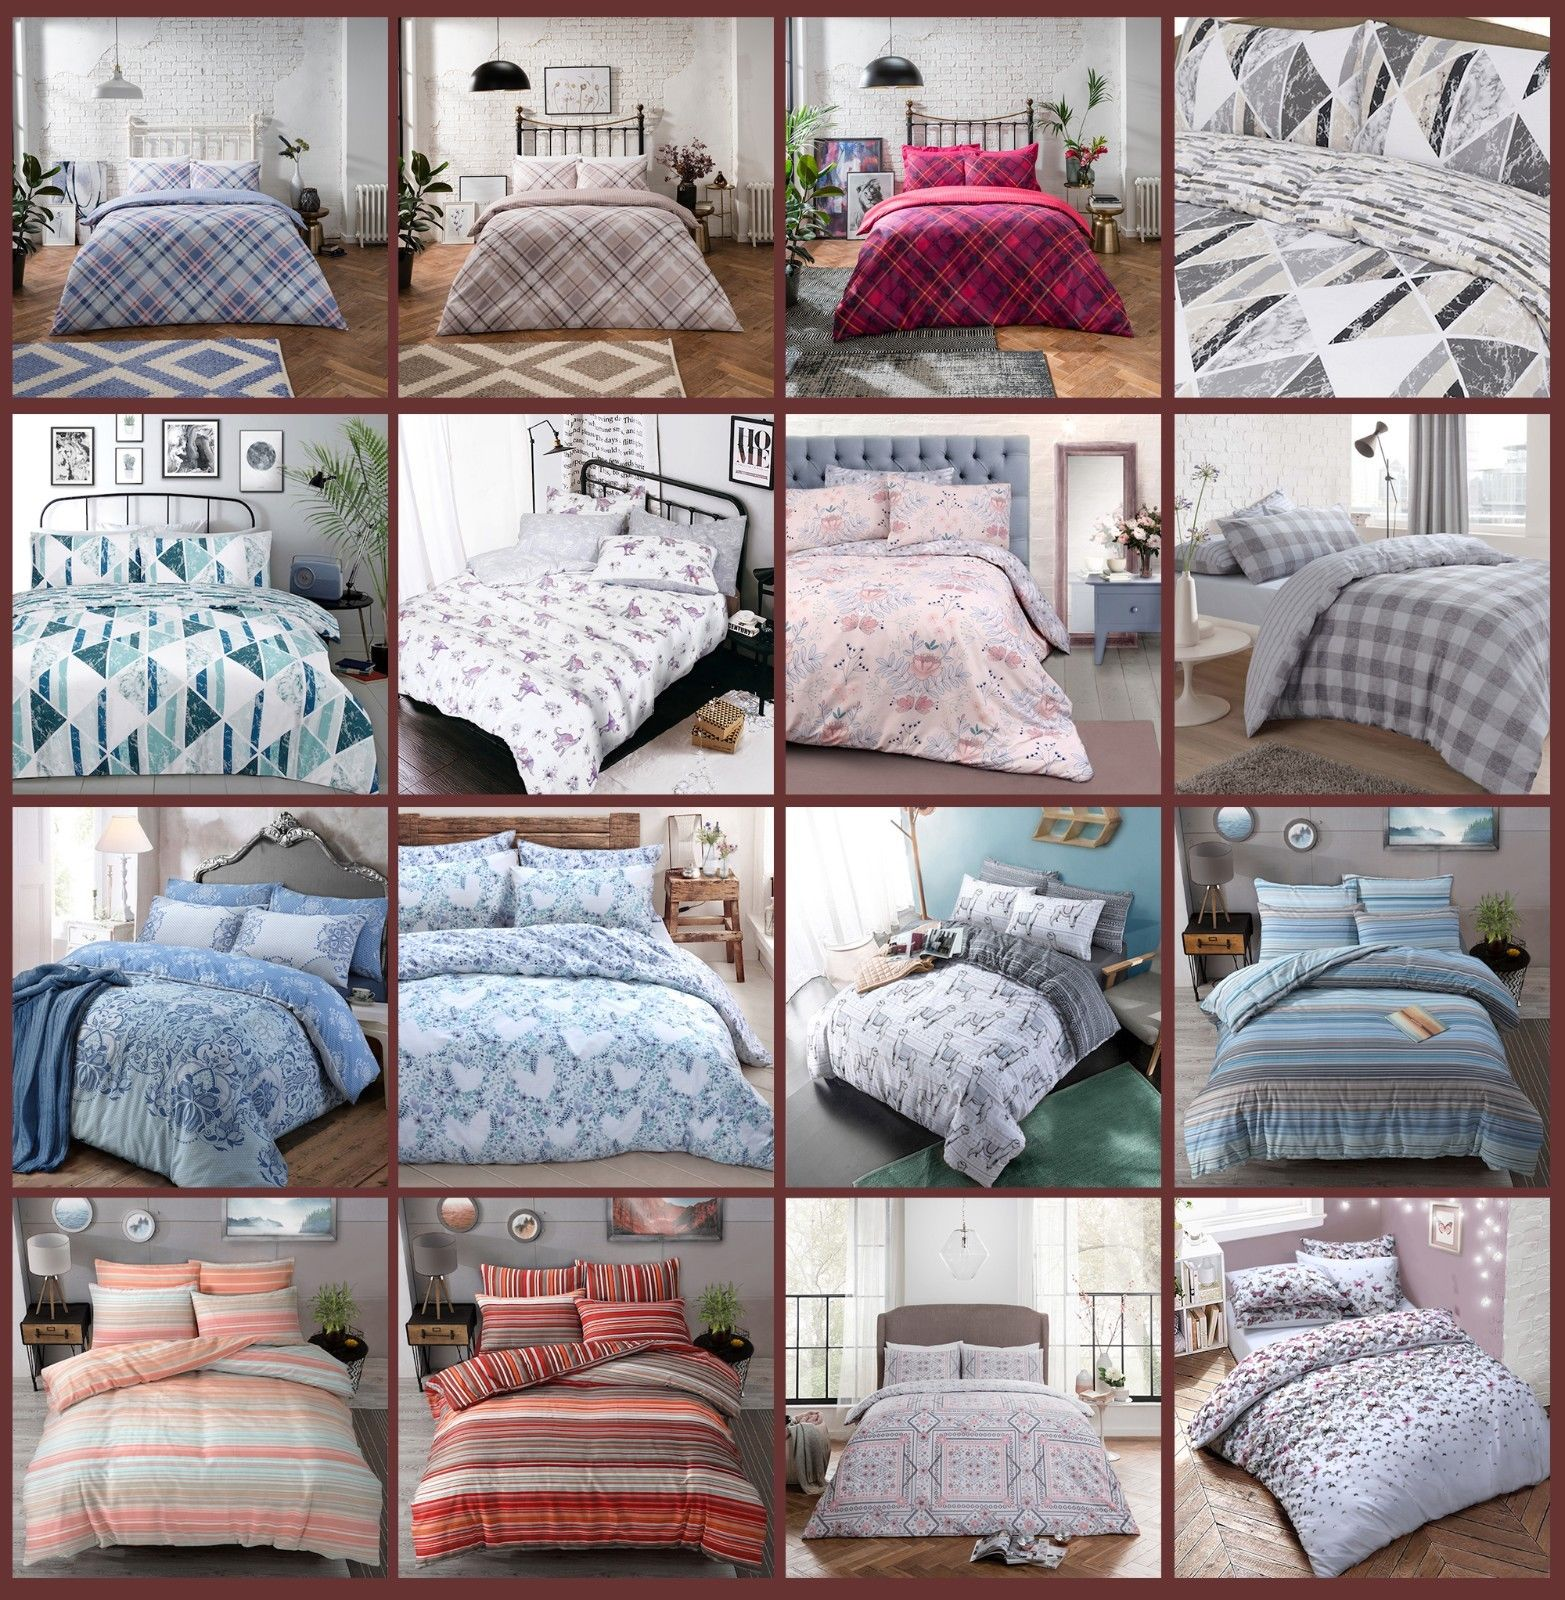 Leafy Love Flower Print Reversible Quilt Duvet Cover /& Pillow Case Bedding Set